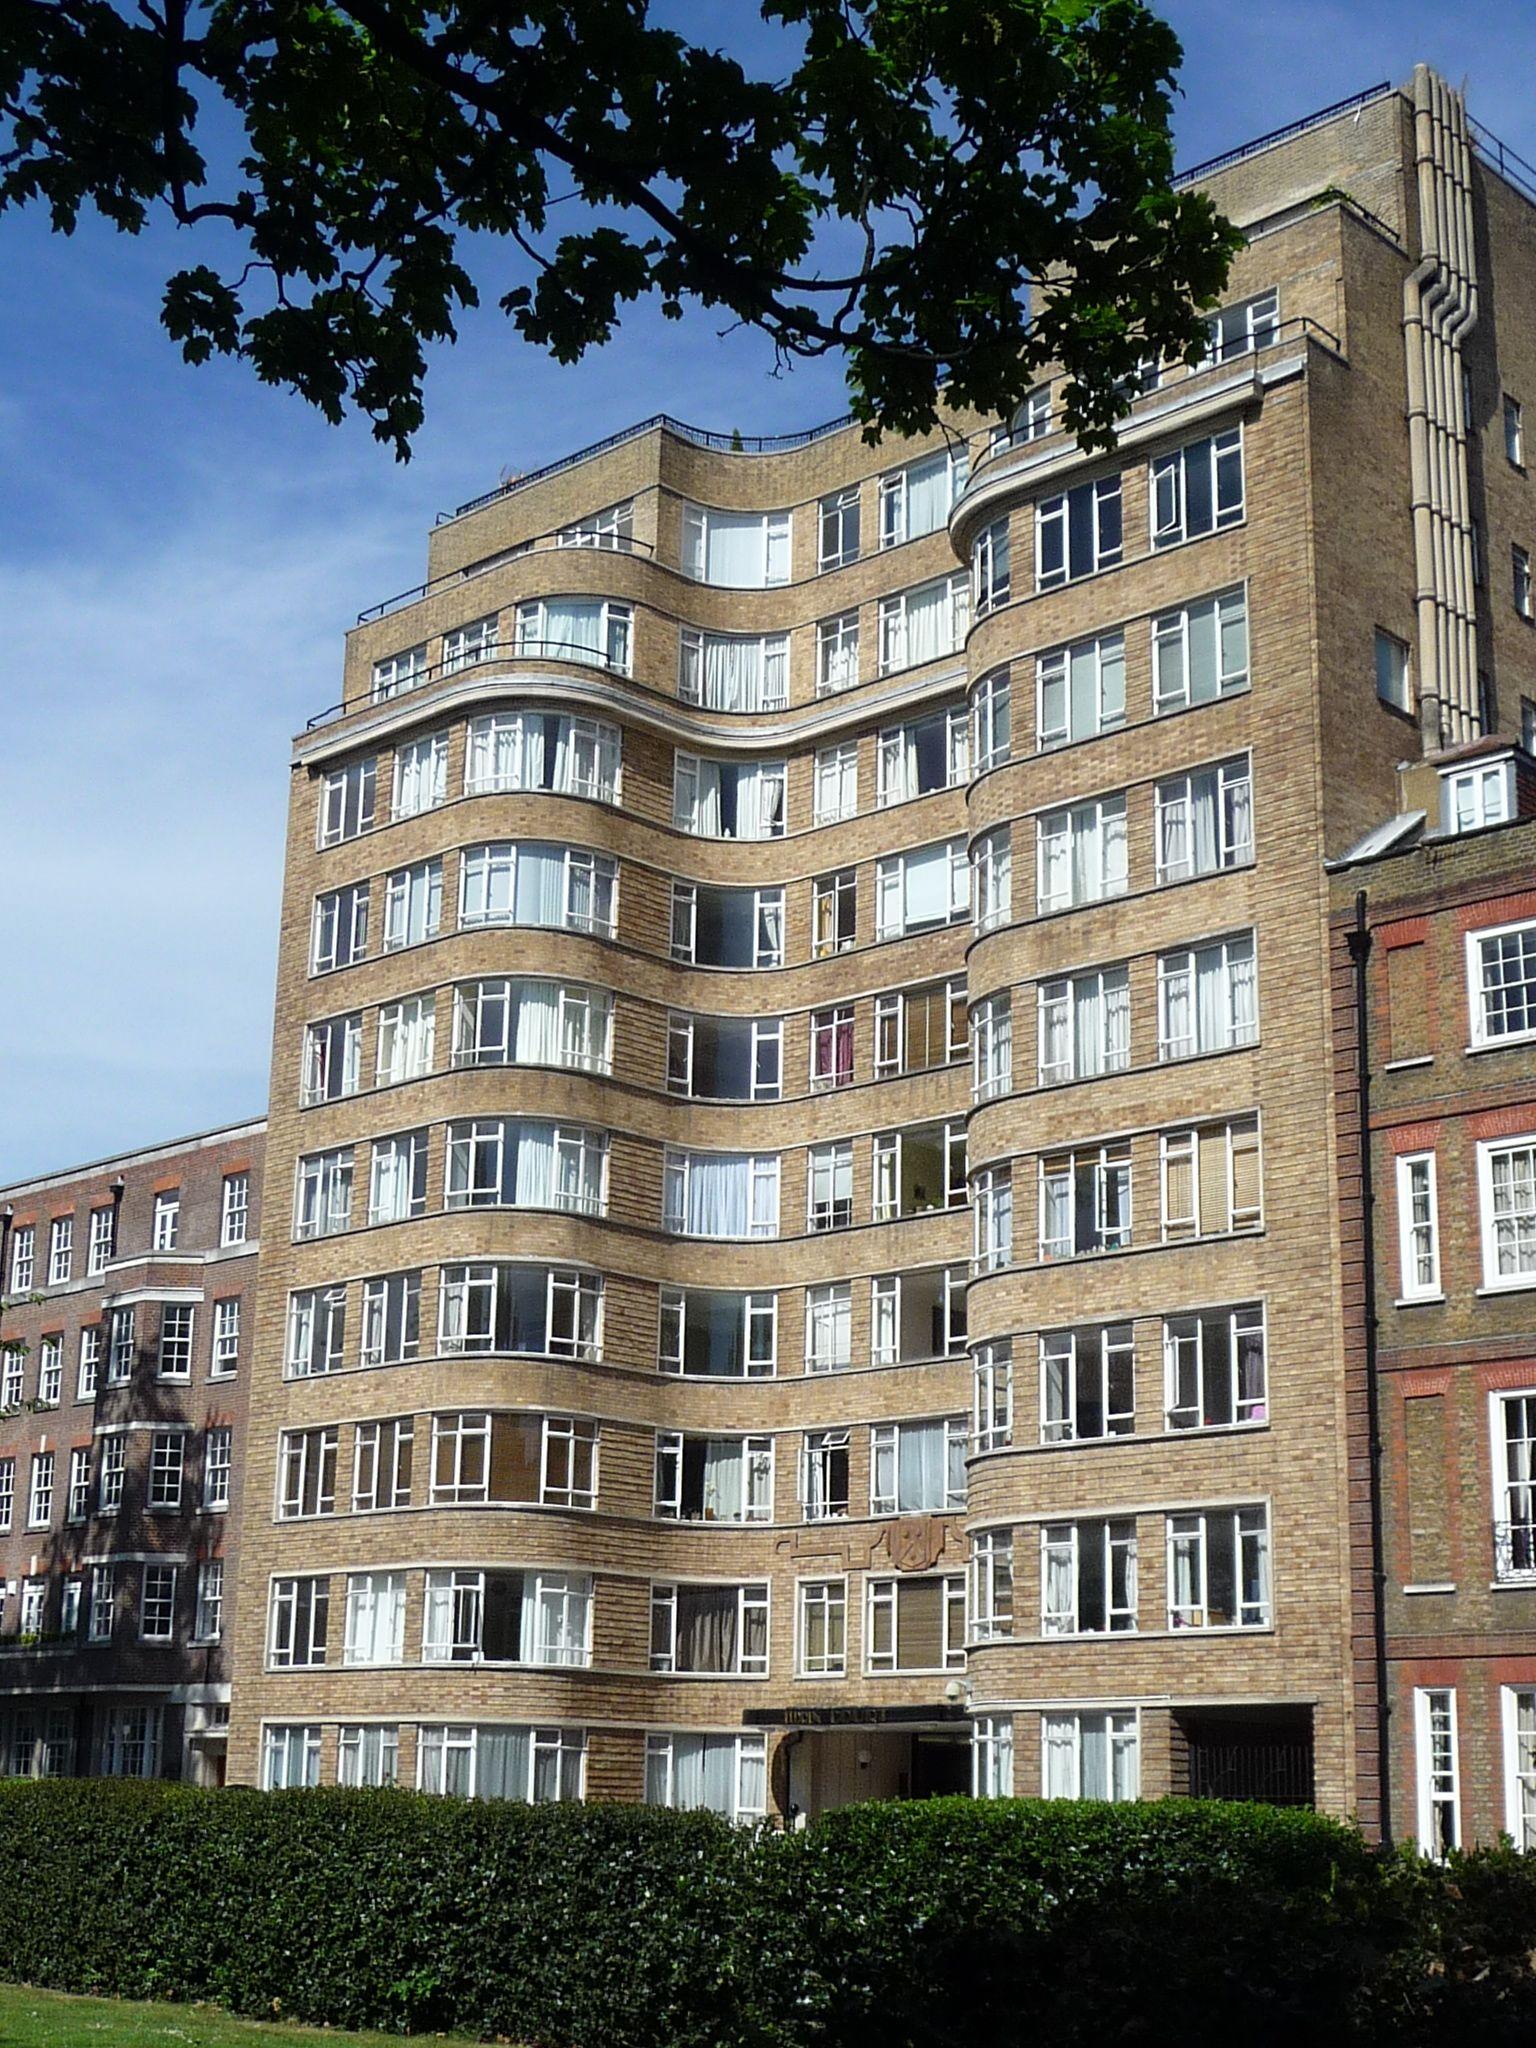 poirot s art deco apartment charterhouse square ec1 london